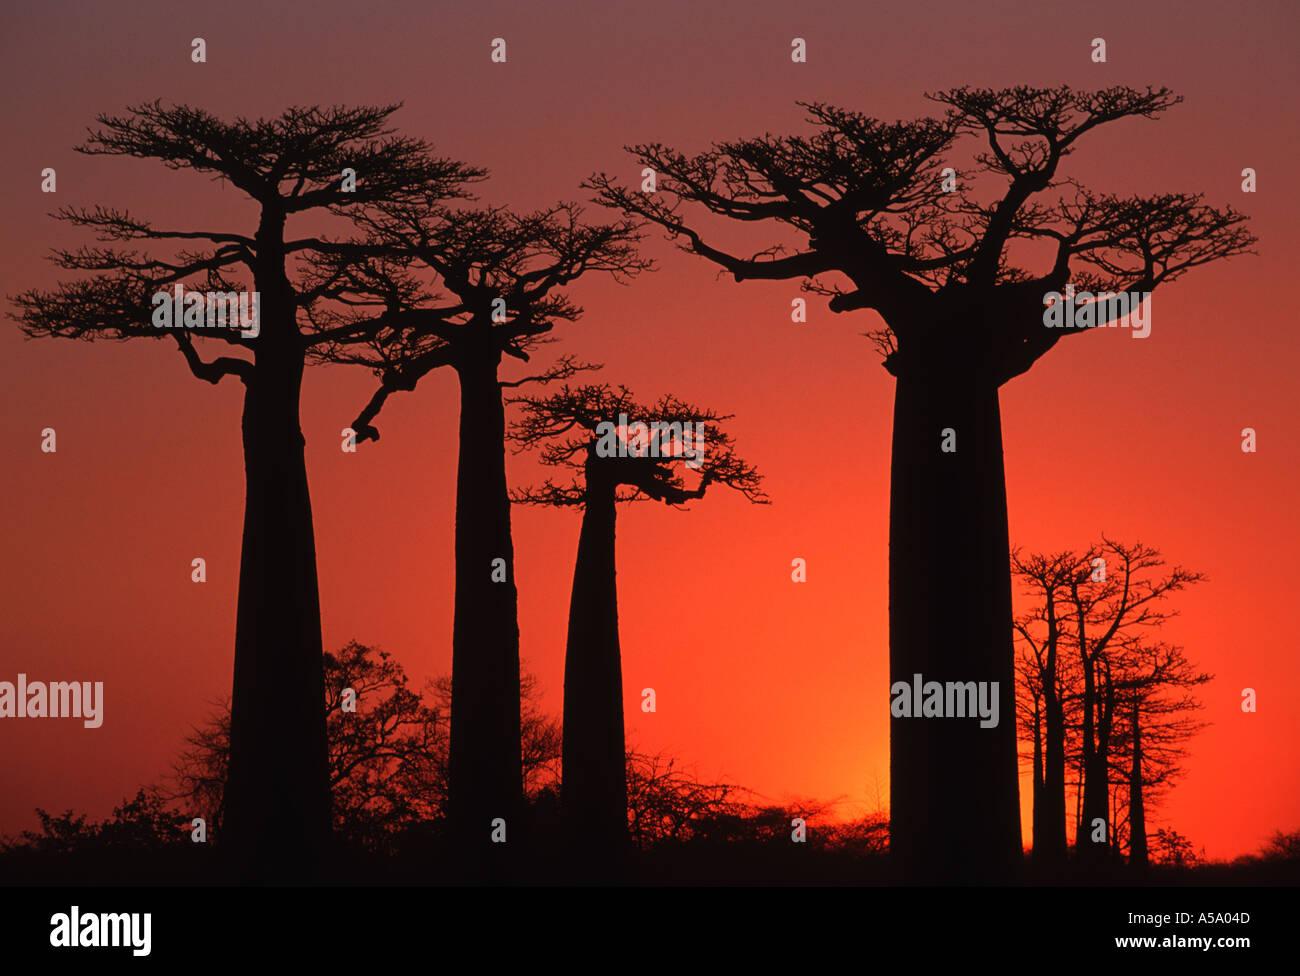 Baobab tree Adansonia grandidieri At sunset near Morondava Madagascar - Stock Image